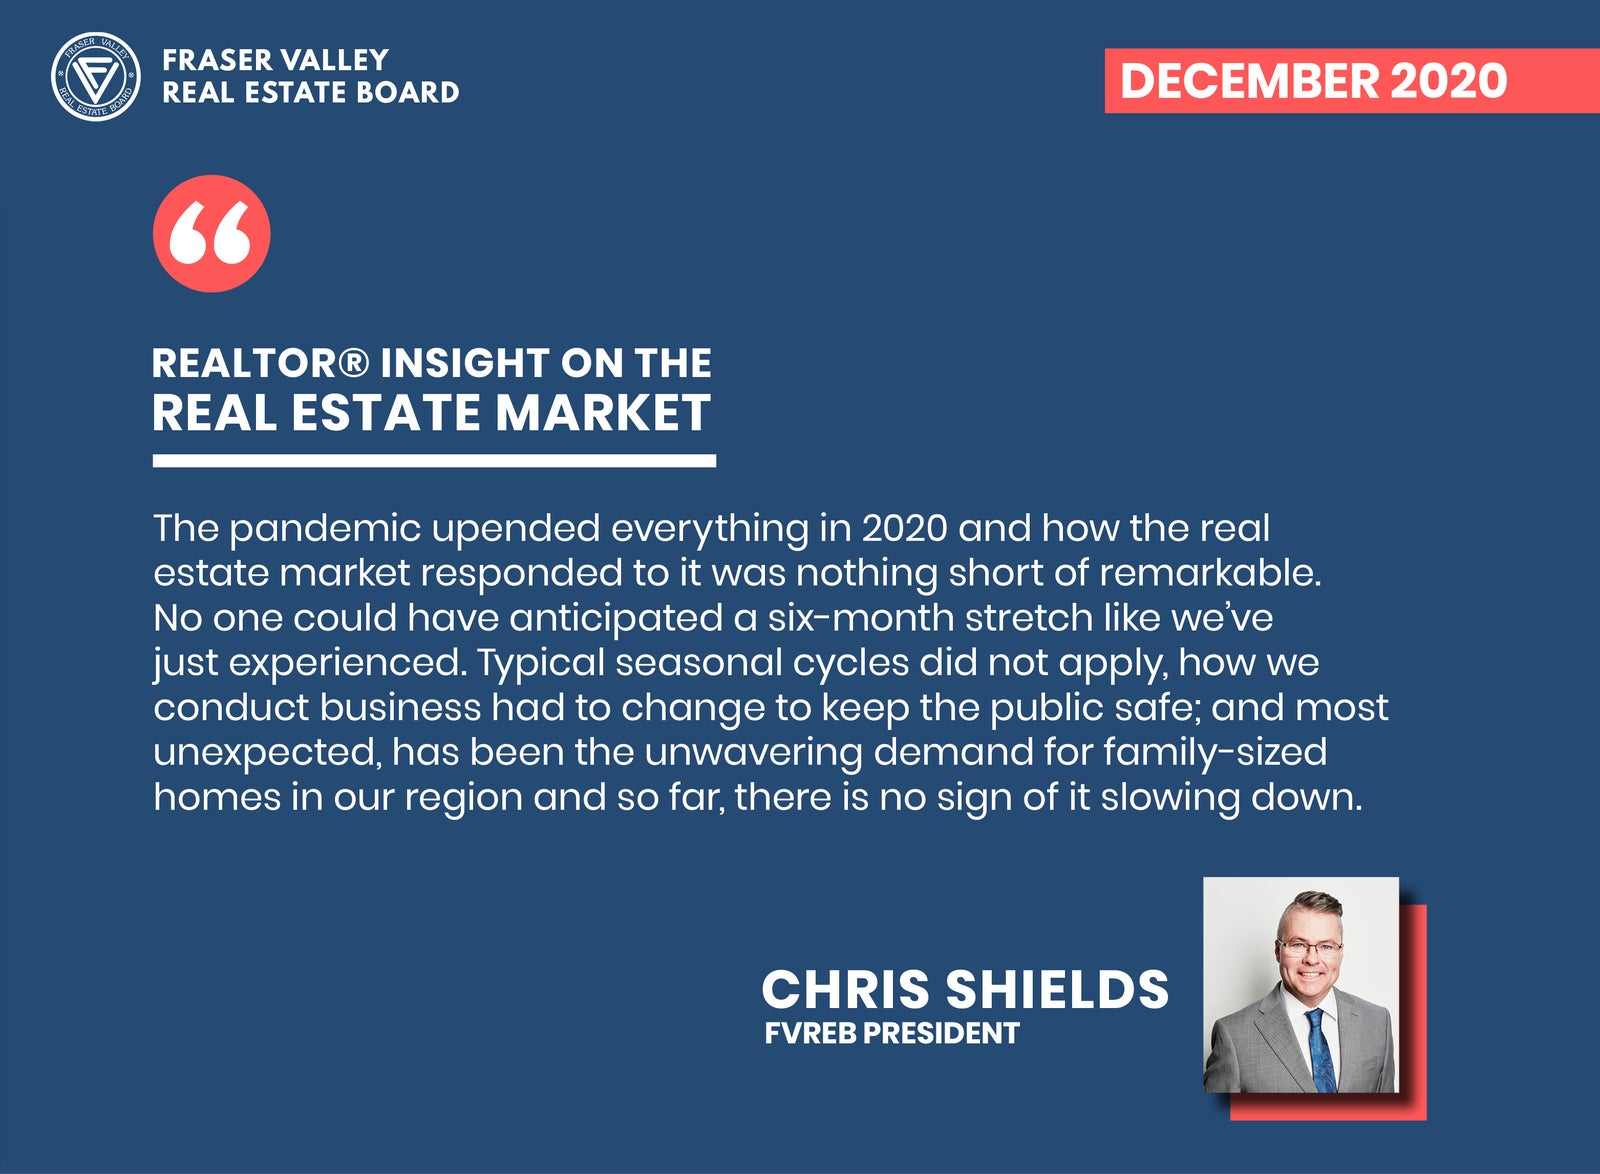 Real Estate Market Insight - Chris Shields